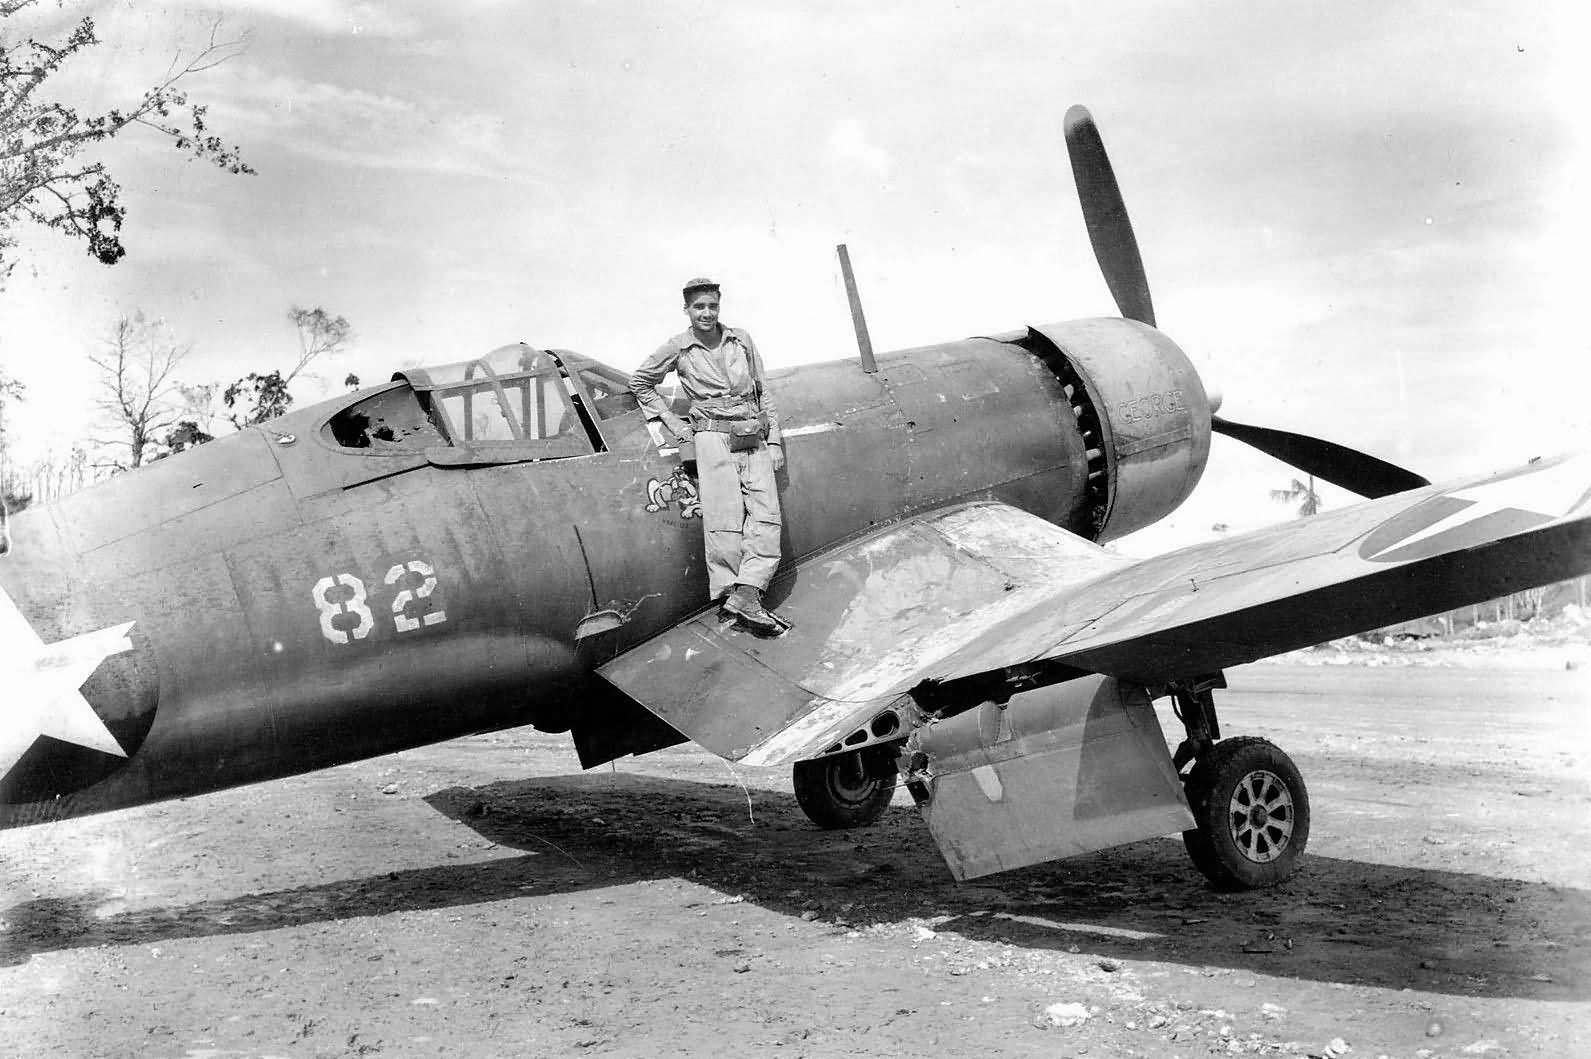 Lt_Huidekoper_VMF-213_F4U-1_Corsair_82-C